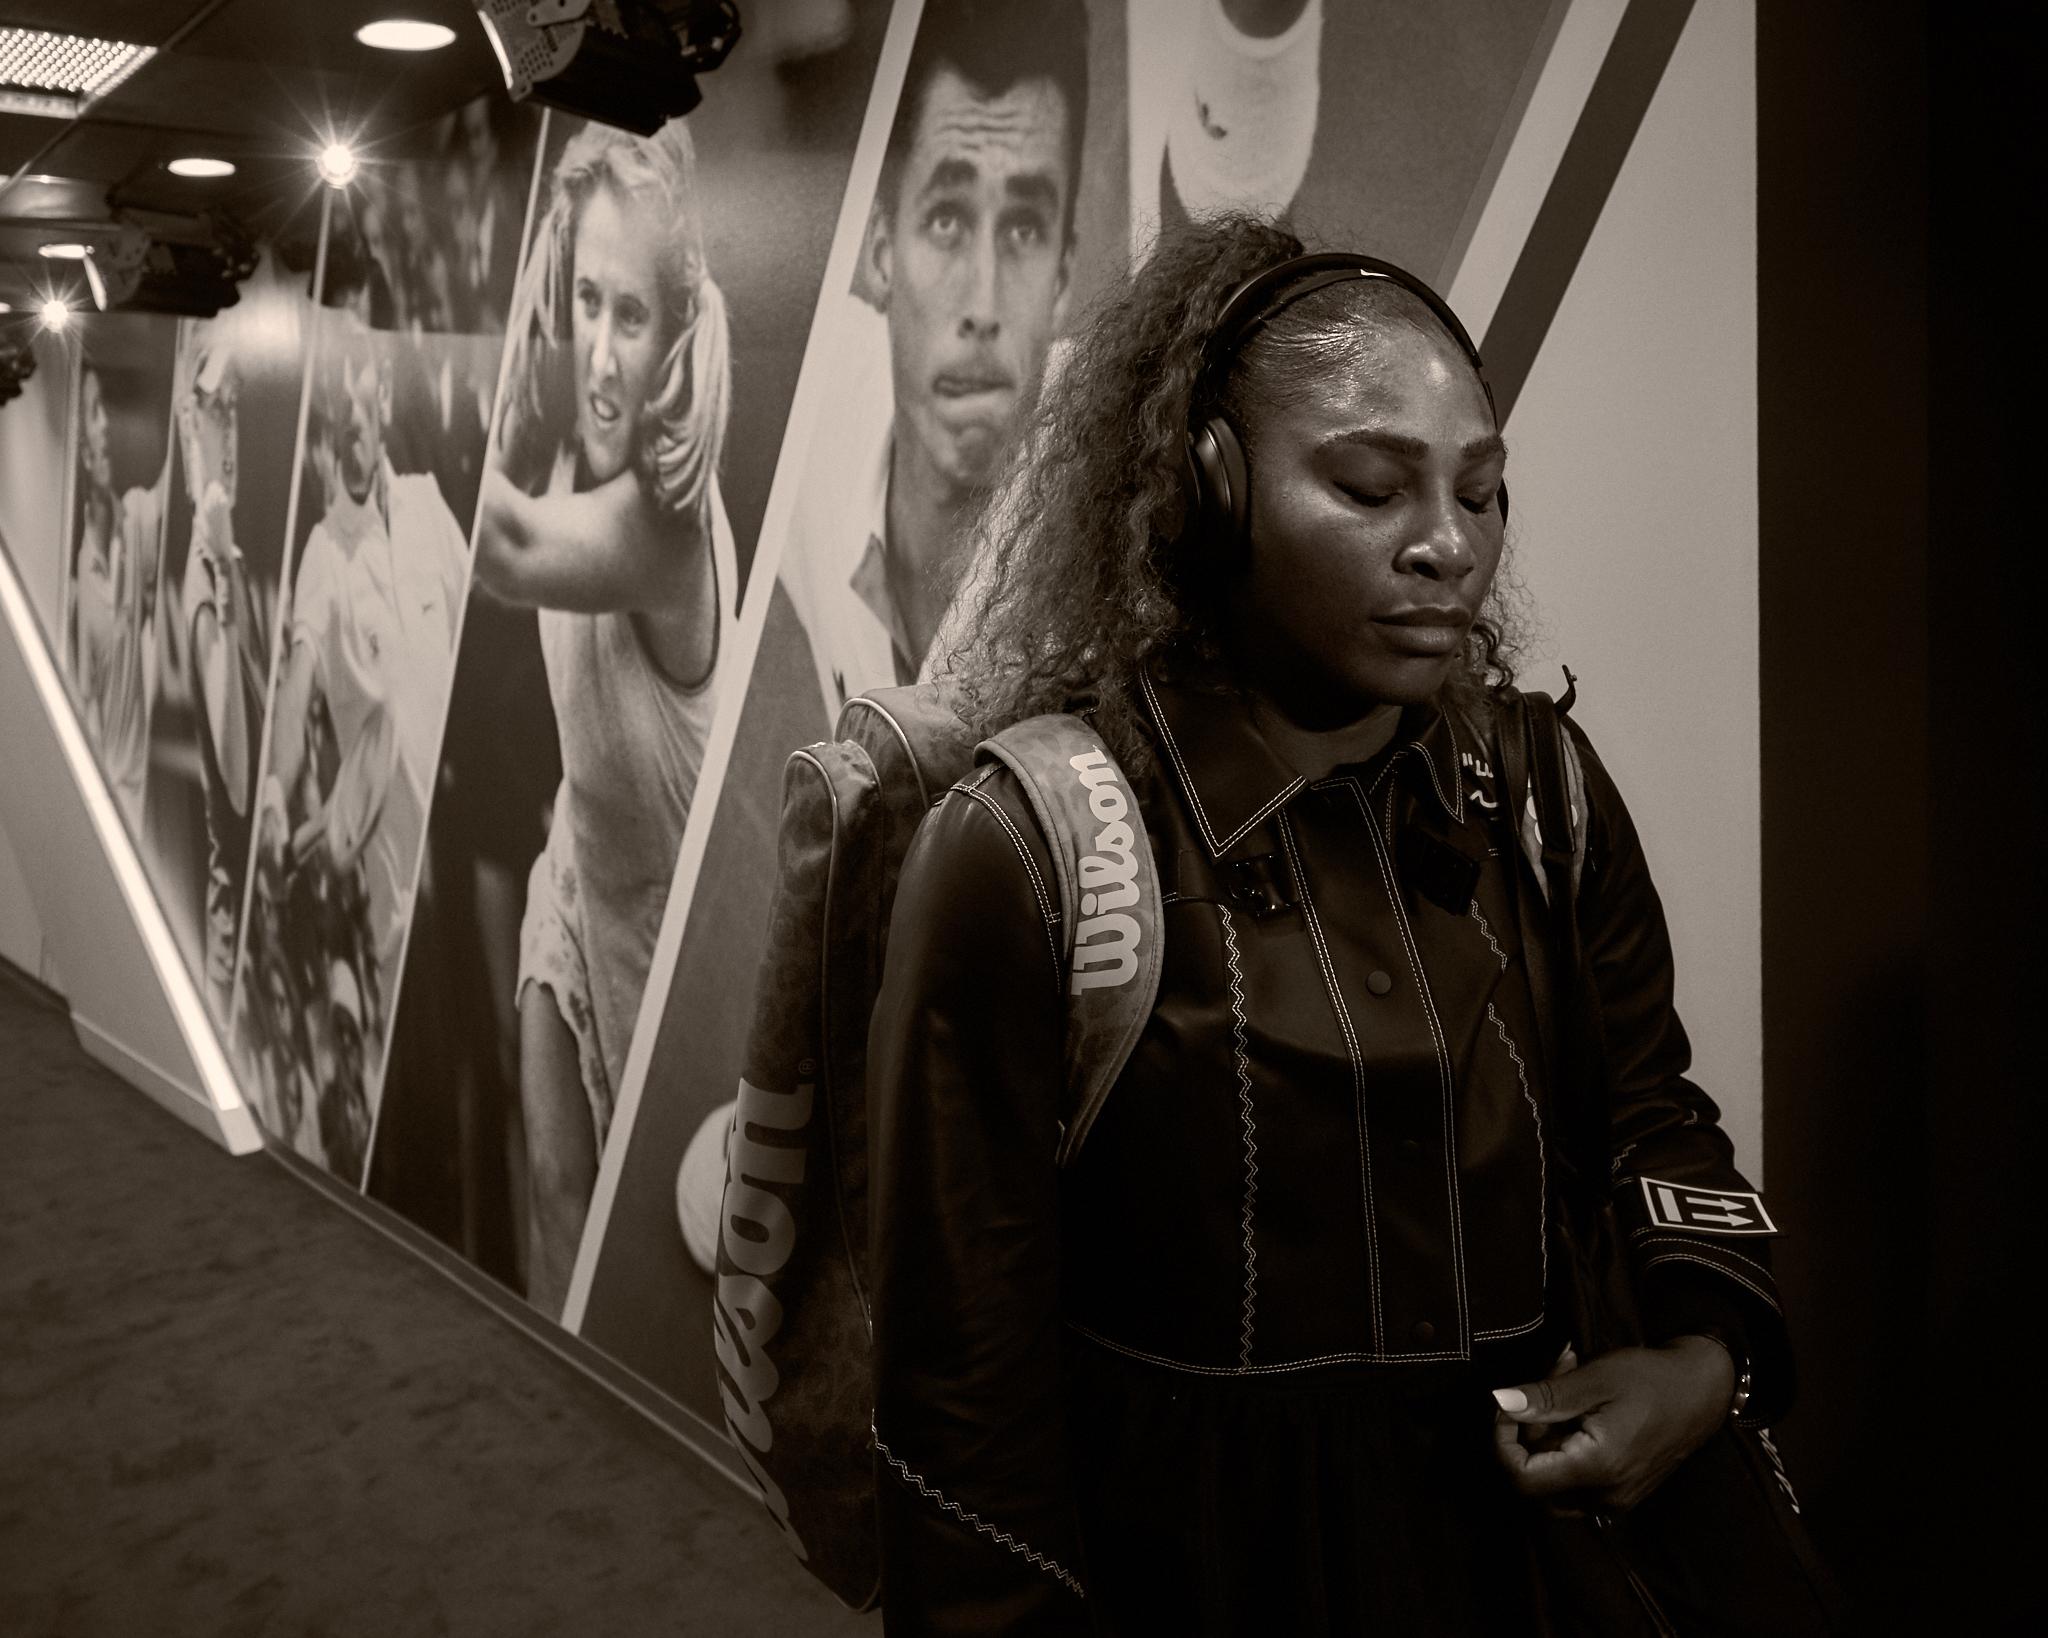 Serena Williams, 3rd round Women's Singles  Sony A7rIII, Sony 24-70mm f2.8 GM